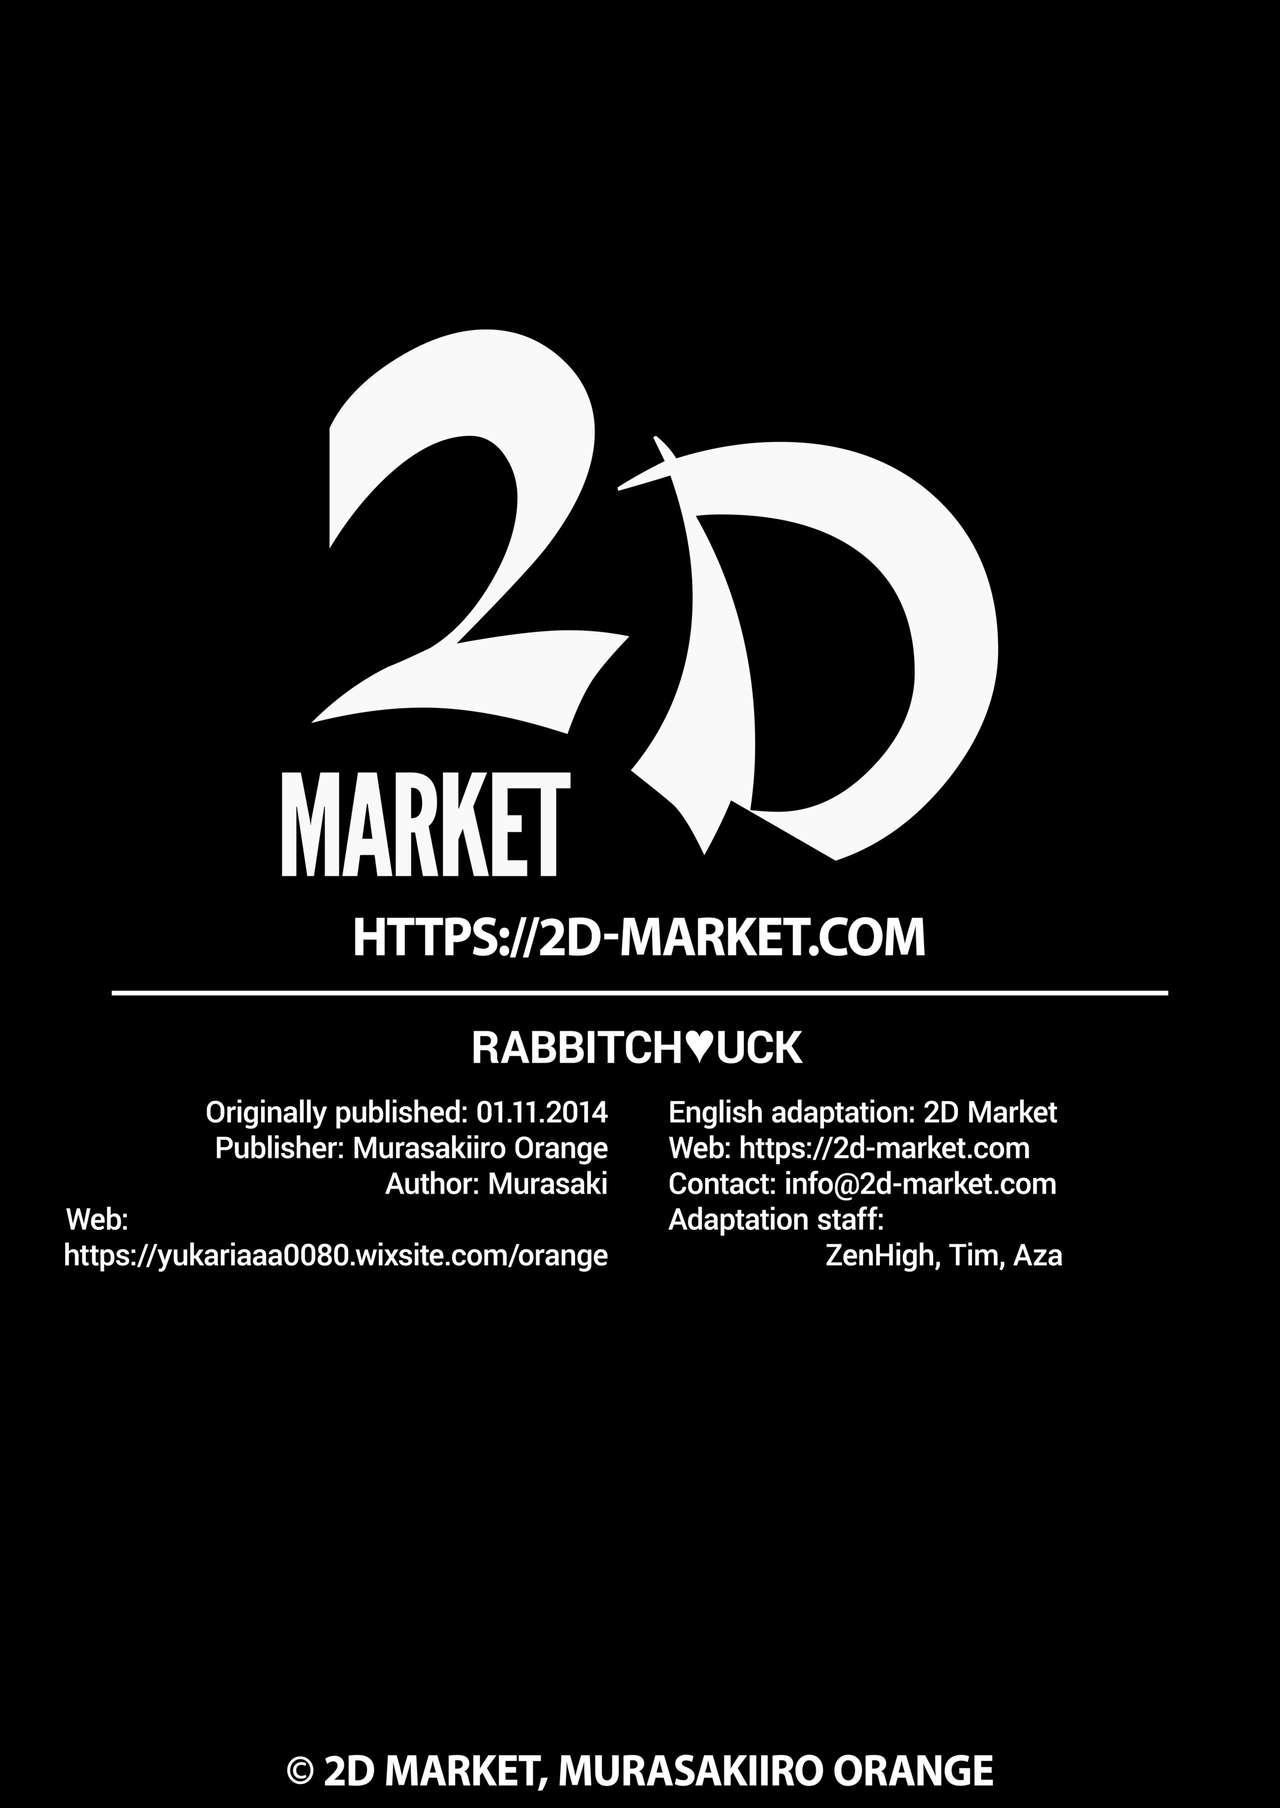 Rabbitch ♥uck   Rabbitch Fuck 22